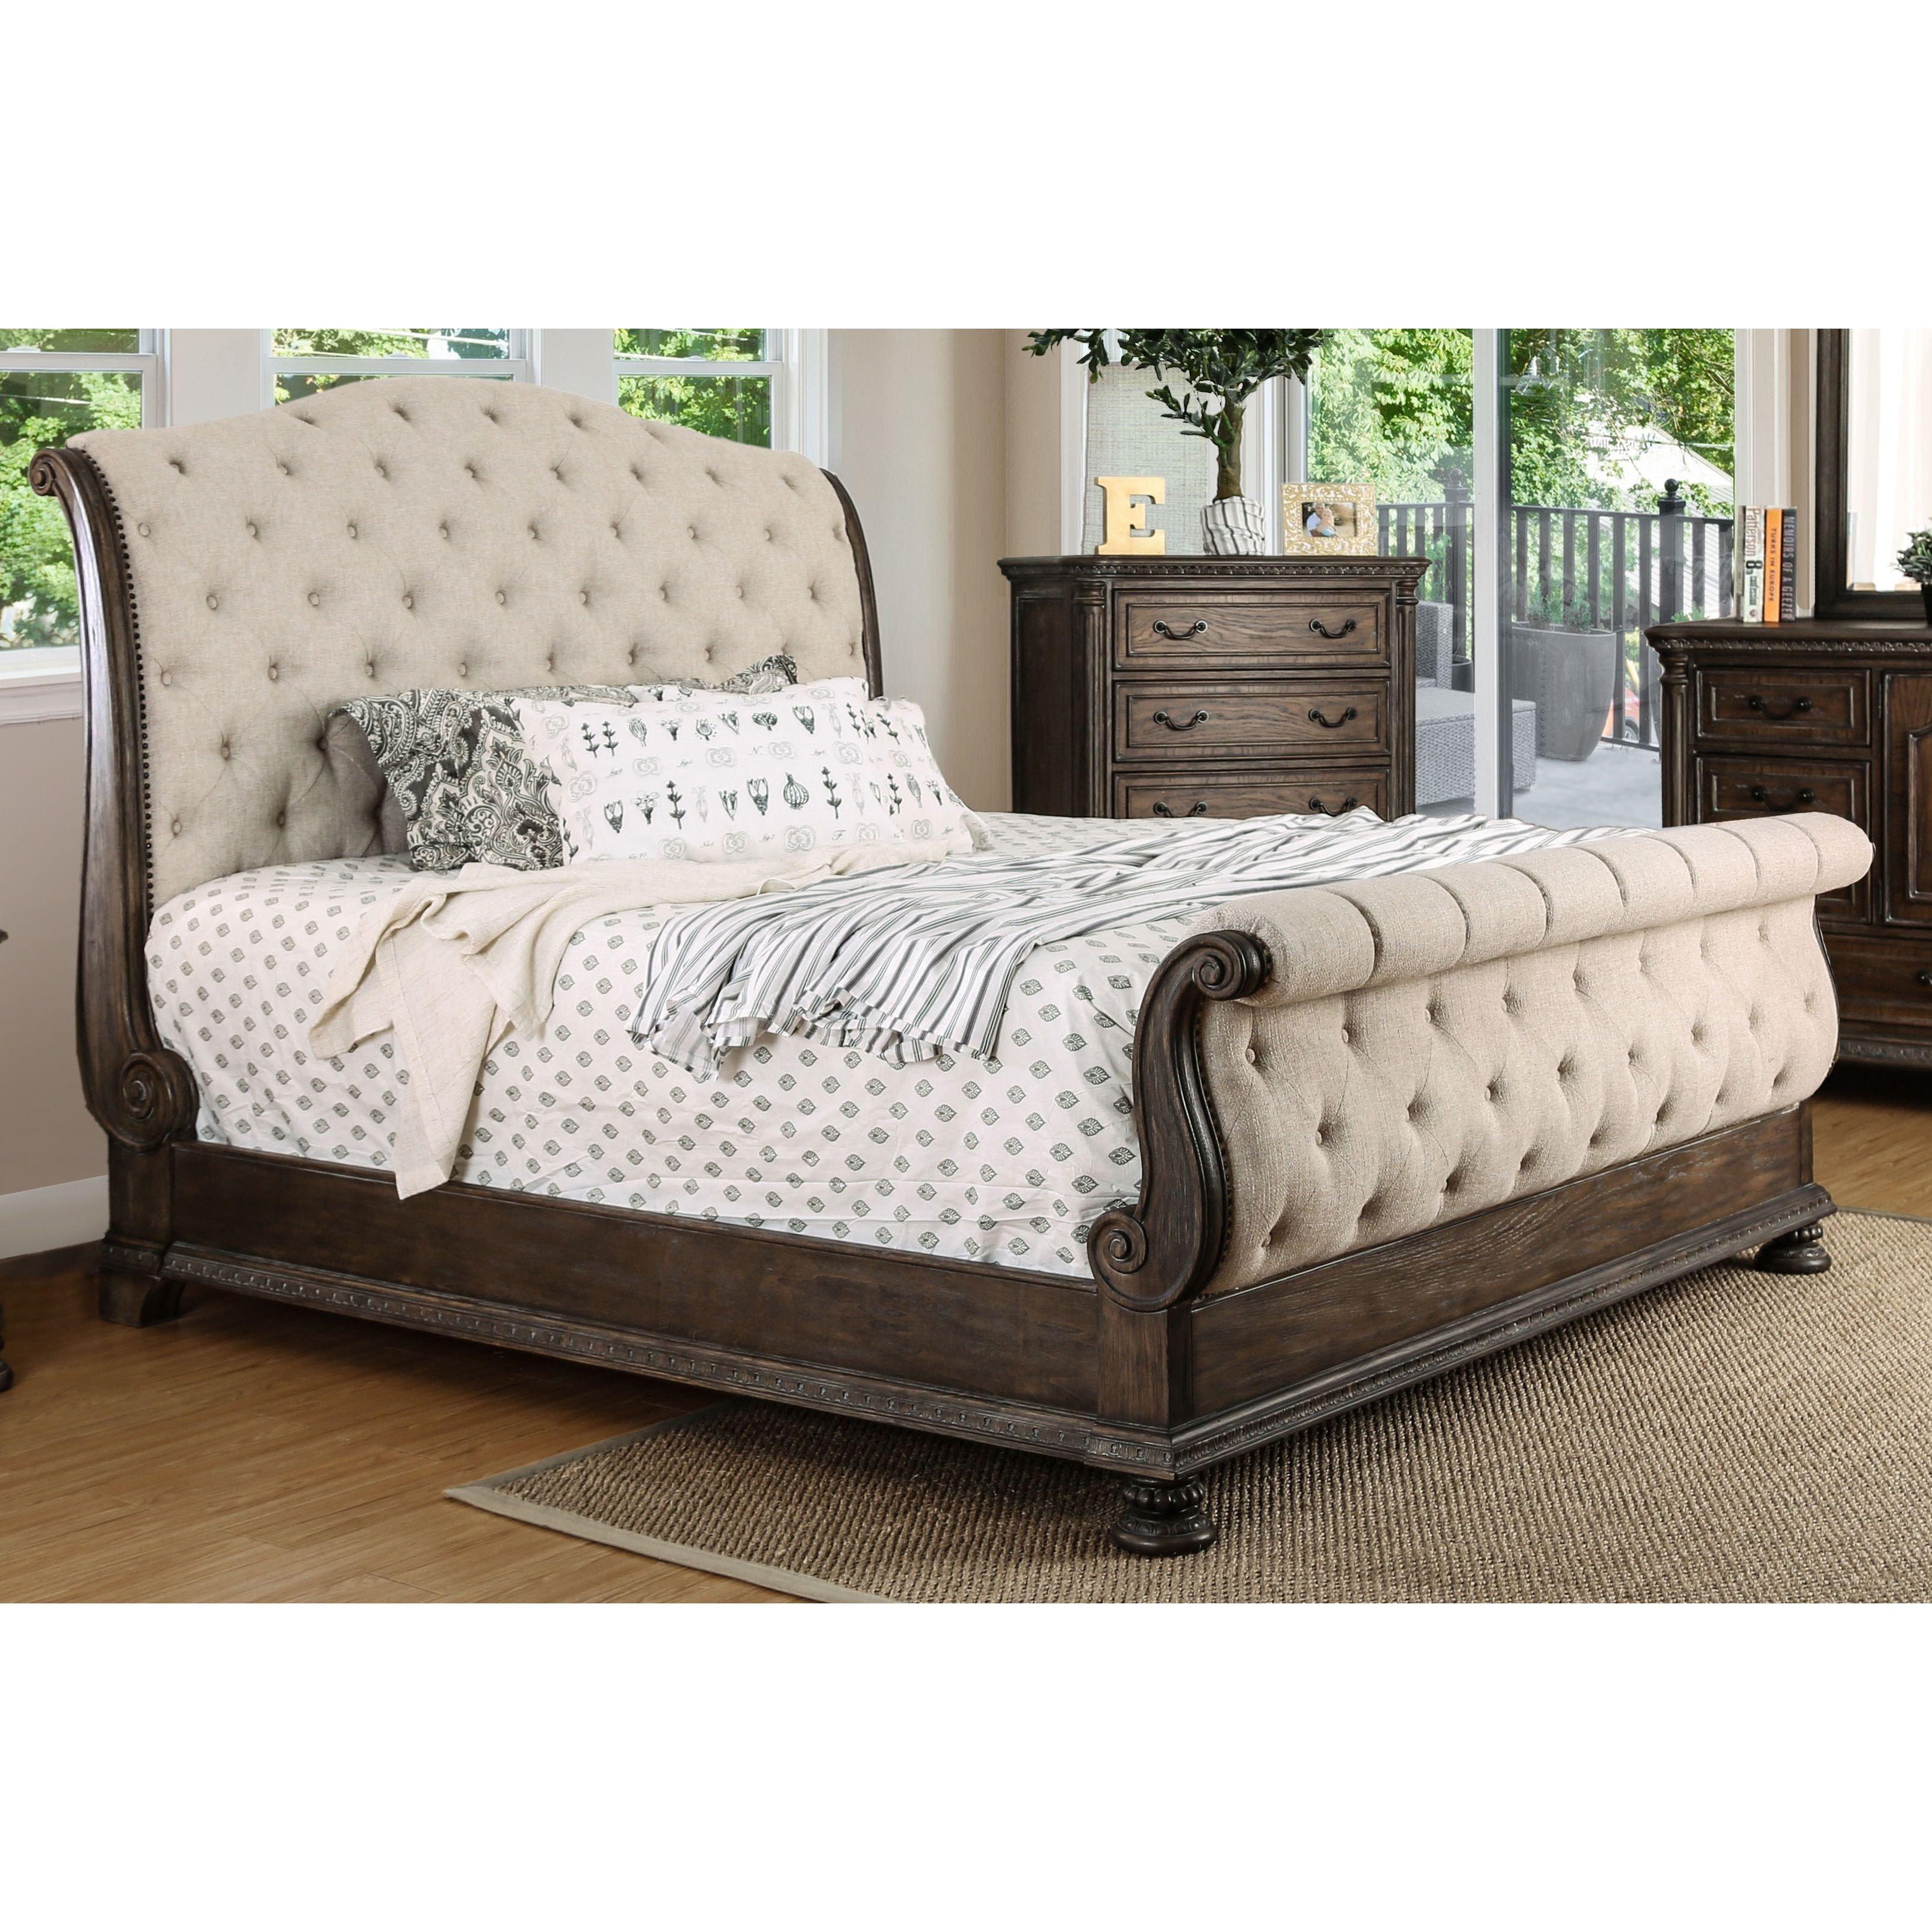 Tufted King Bedroom Set Fresh Furniture Of America Bri Te Iii Traditional ornate Rustic